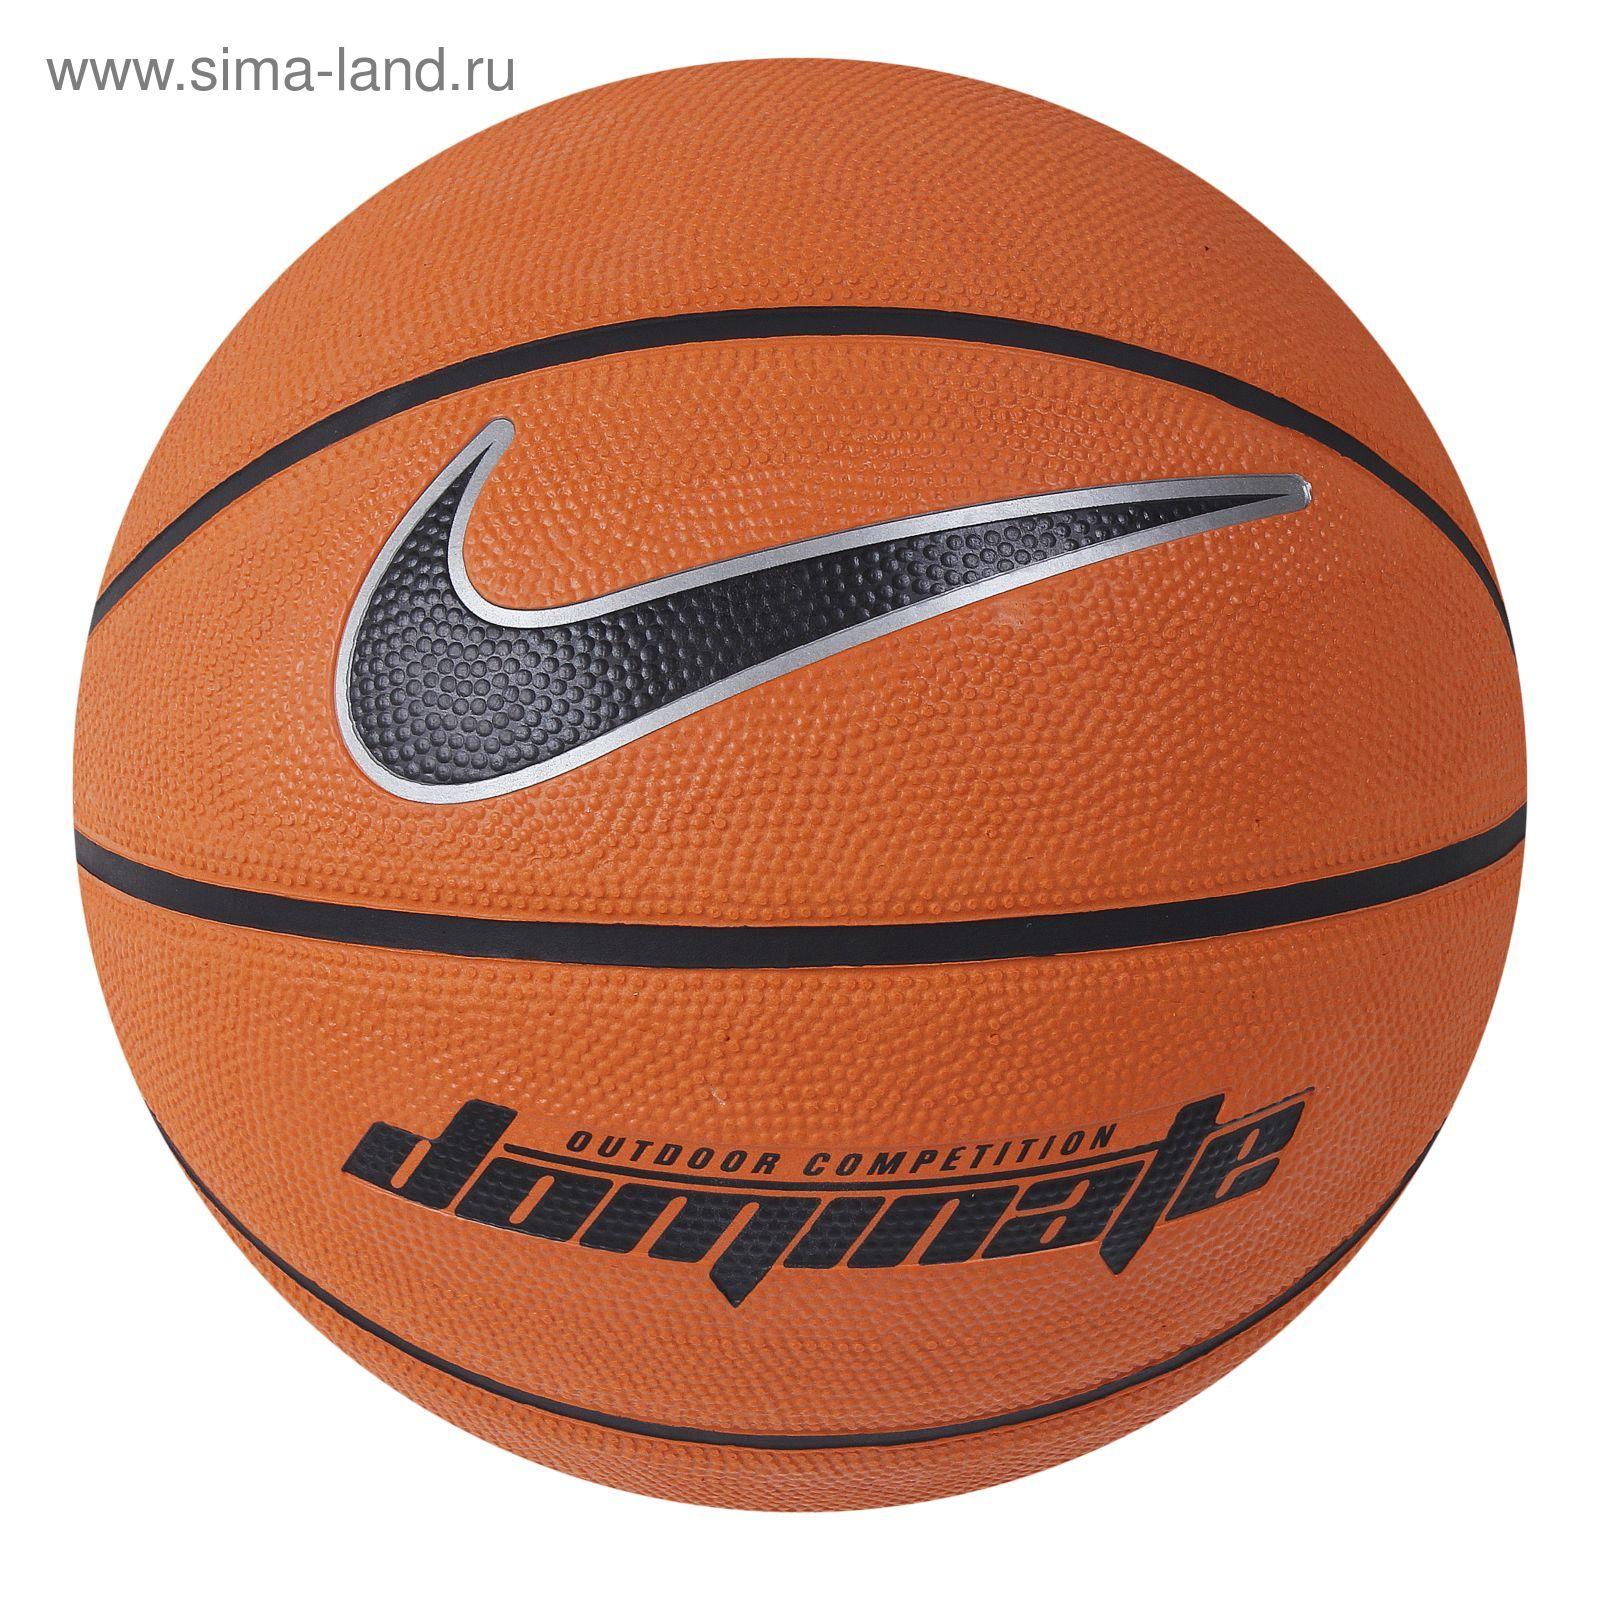 cbb08e80 Мяч баскетбольный Nike Dominate, размер 7 (1632144) - Купить по цене ...